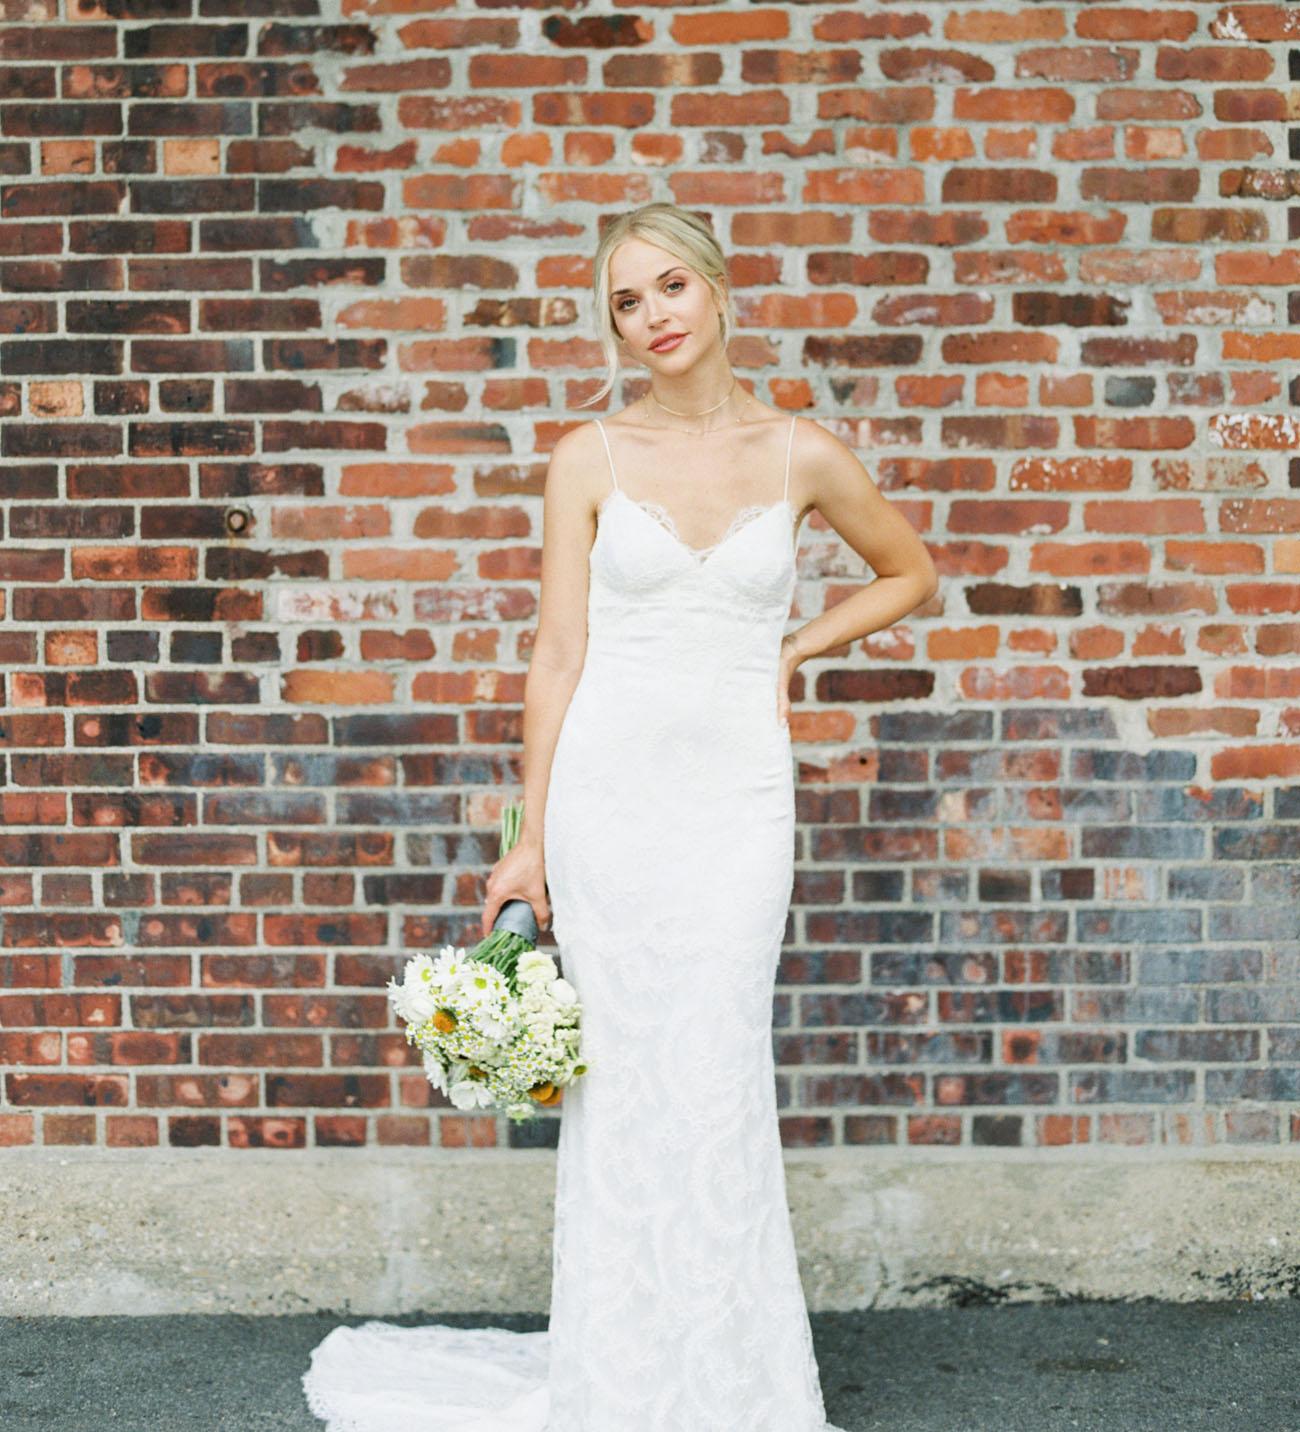 Katie May Wedding Dress